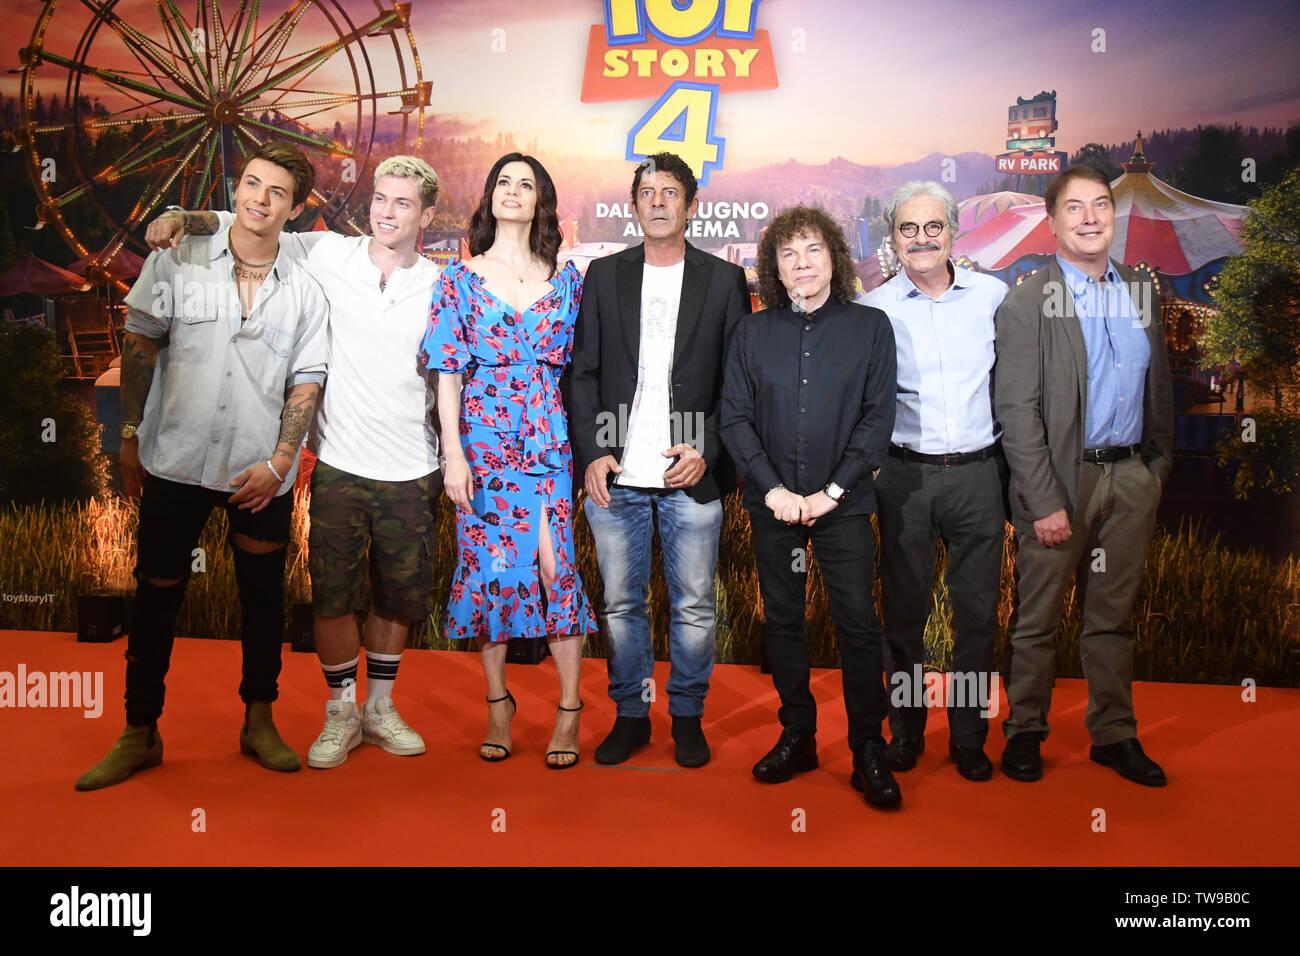 Rome 18 Giu 2019 hotel Parco dei Principi movie presentation TOY STORY 4 Cast Italian voices Credit: Giuseppe Andidero - Stock Image